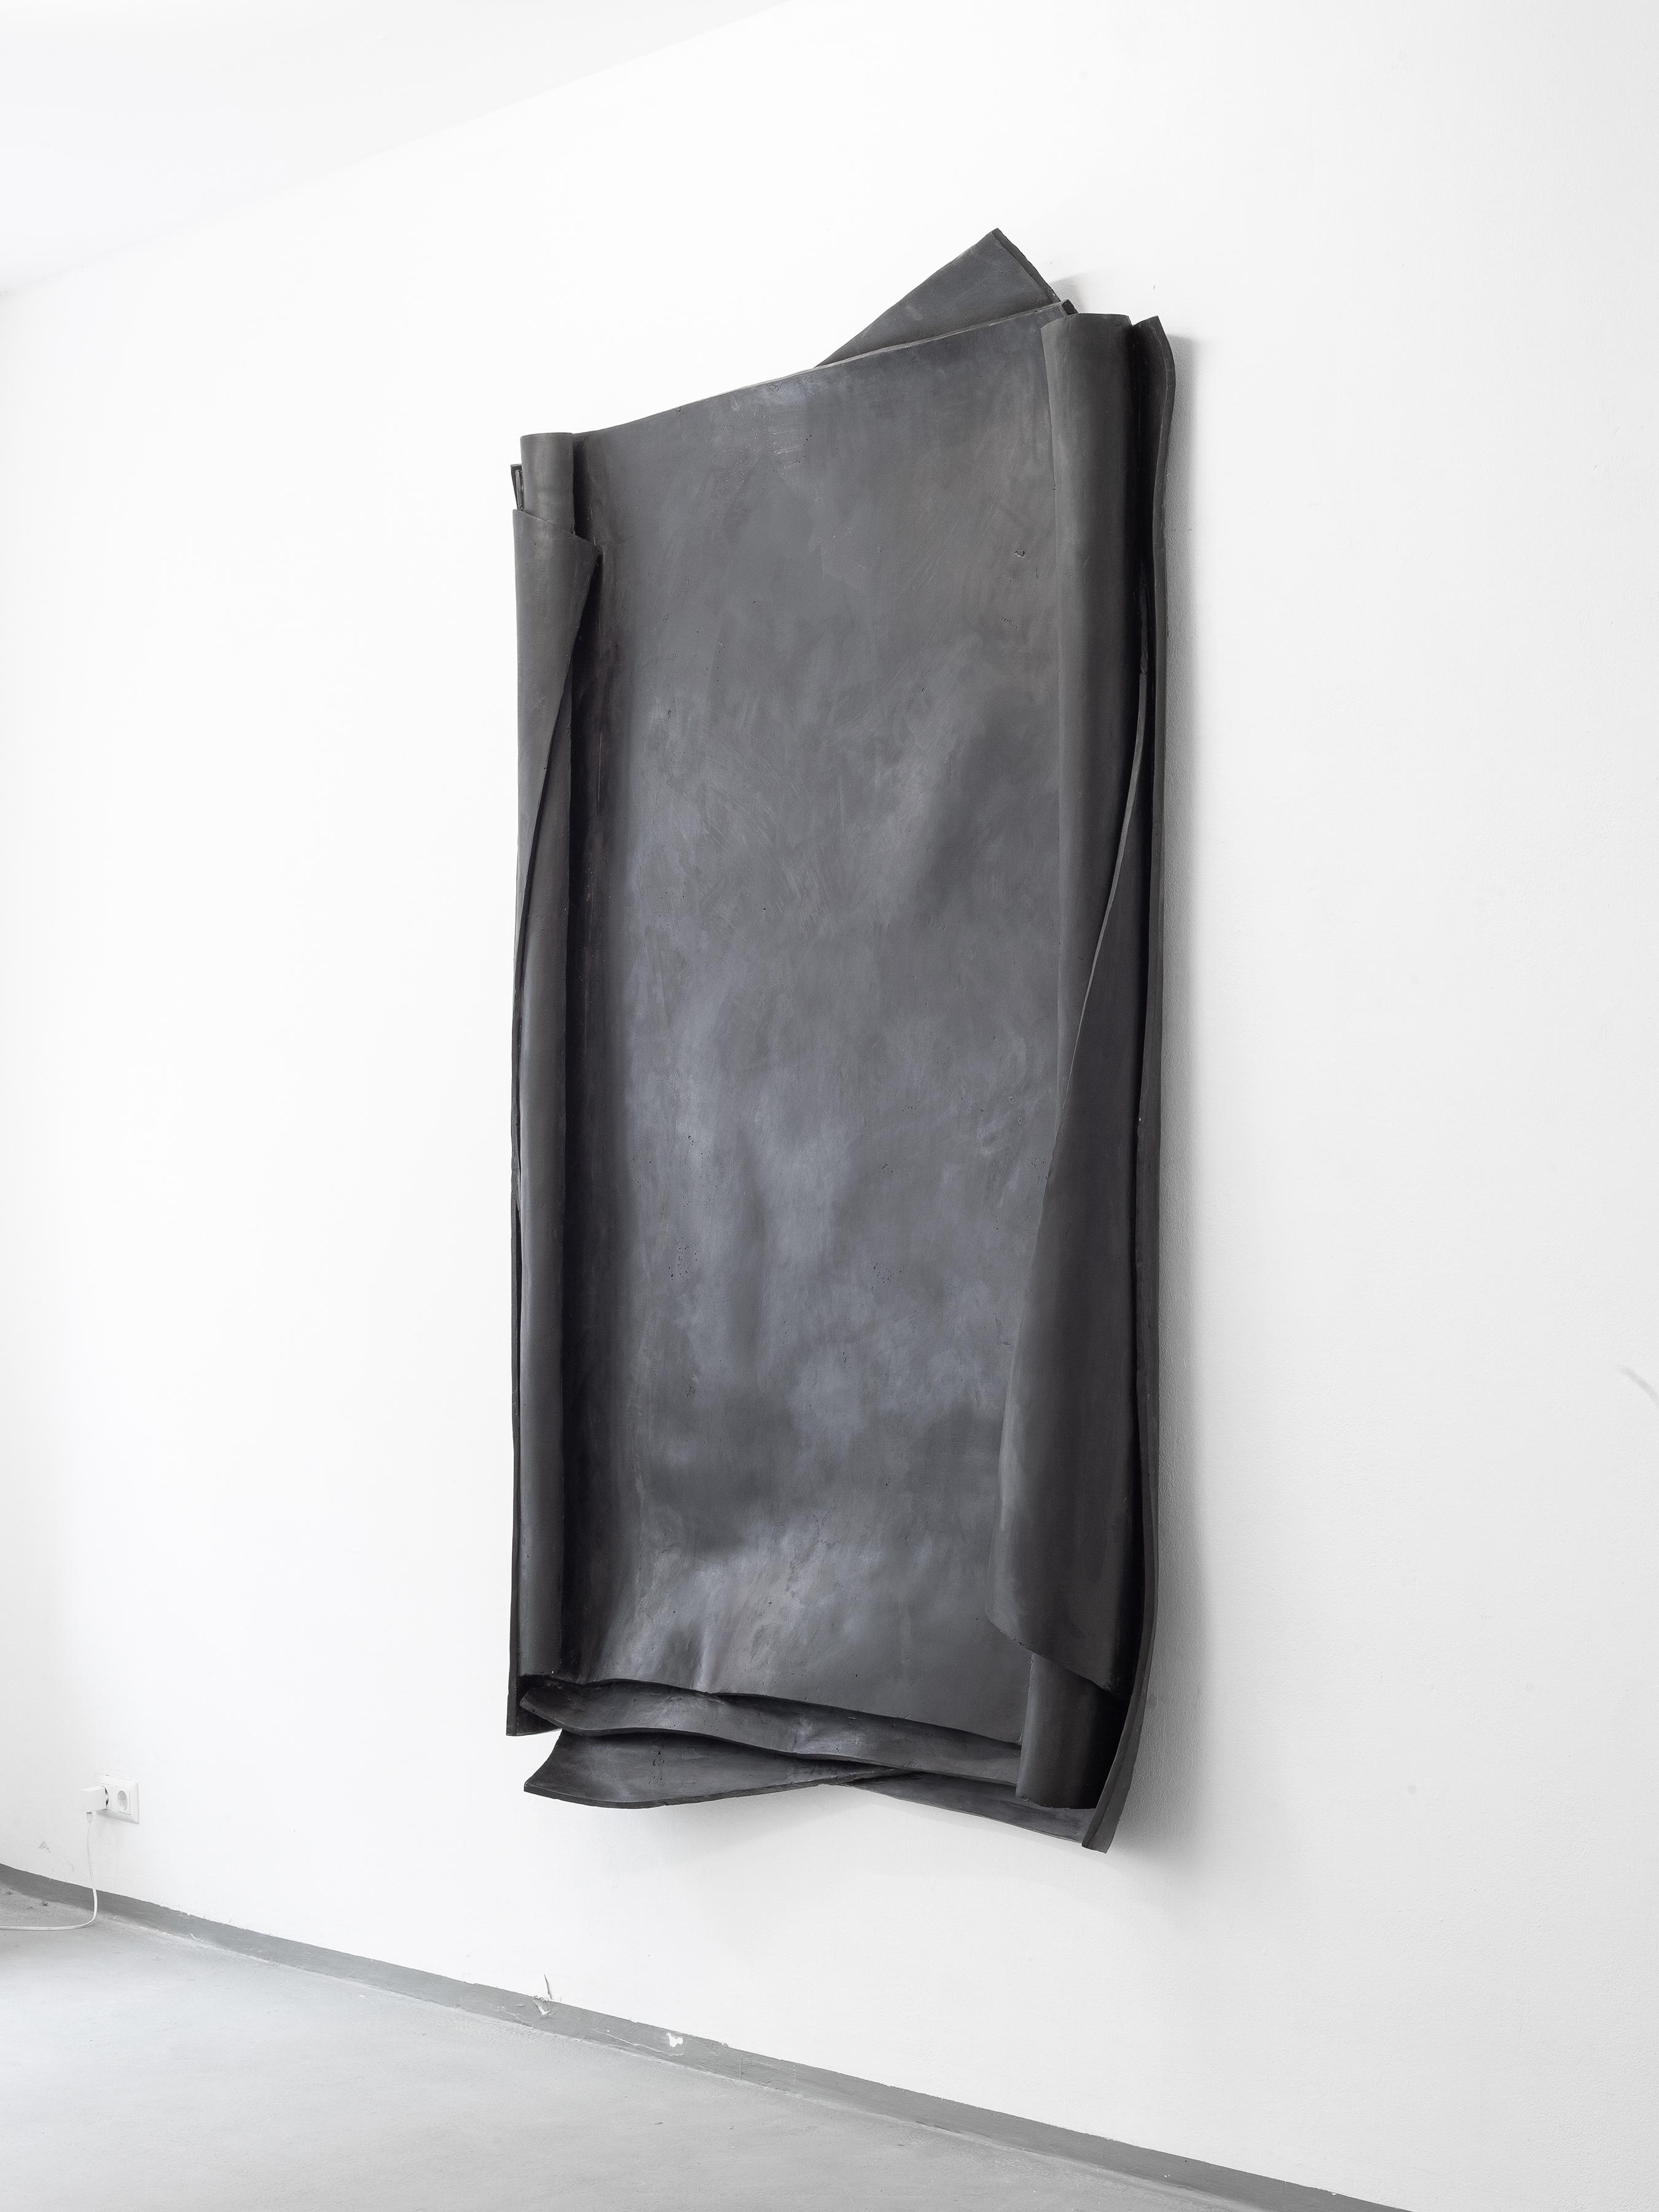 Artwork by Erik Andersen - Besser Vertikal 02, 2021 - Black Skulptur - Installation View at Diskurs Berlin